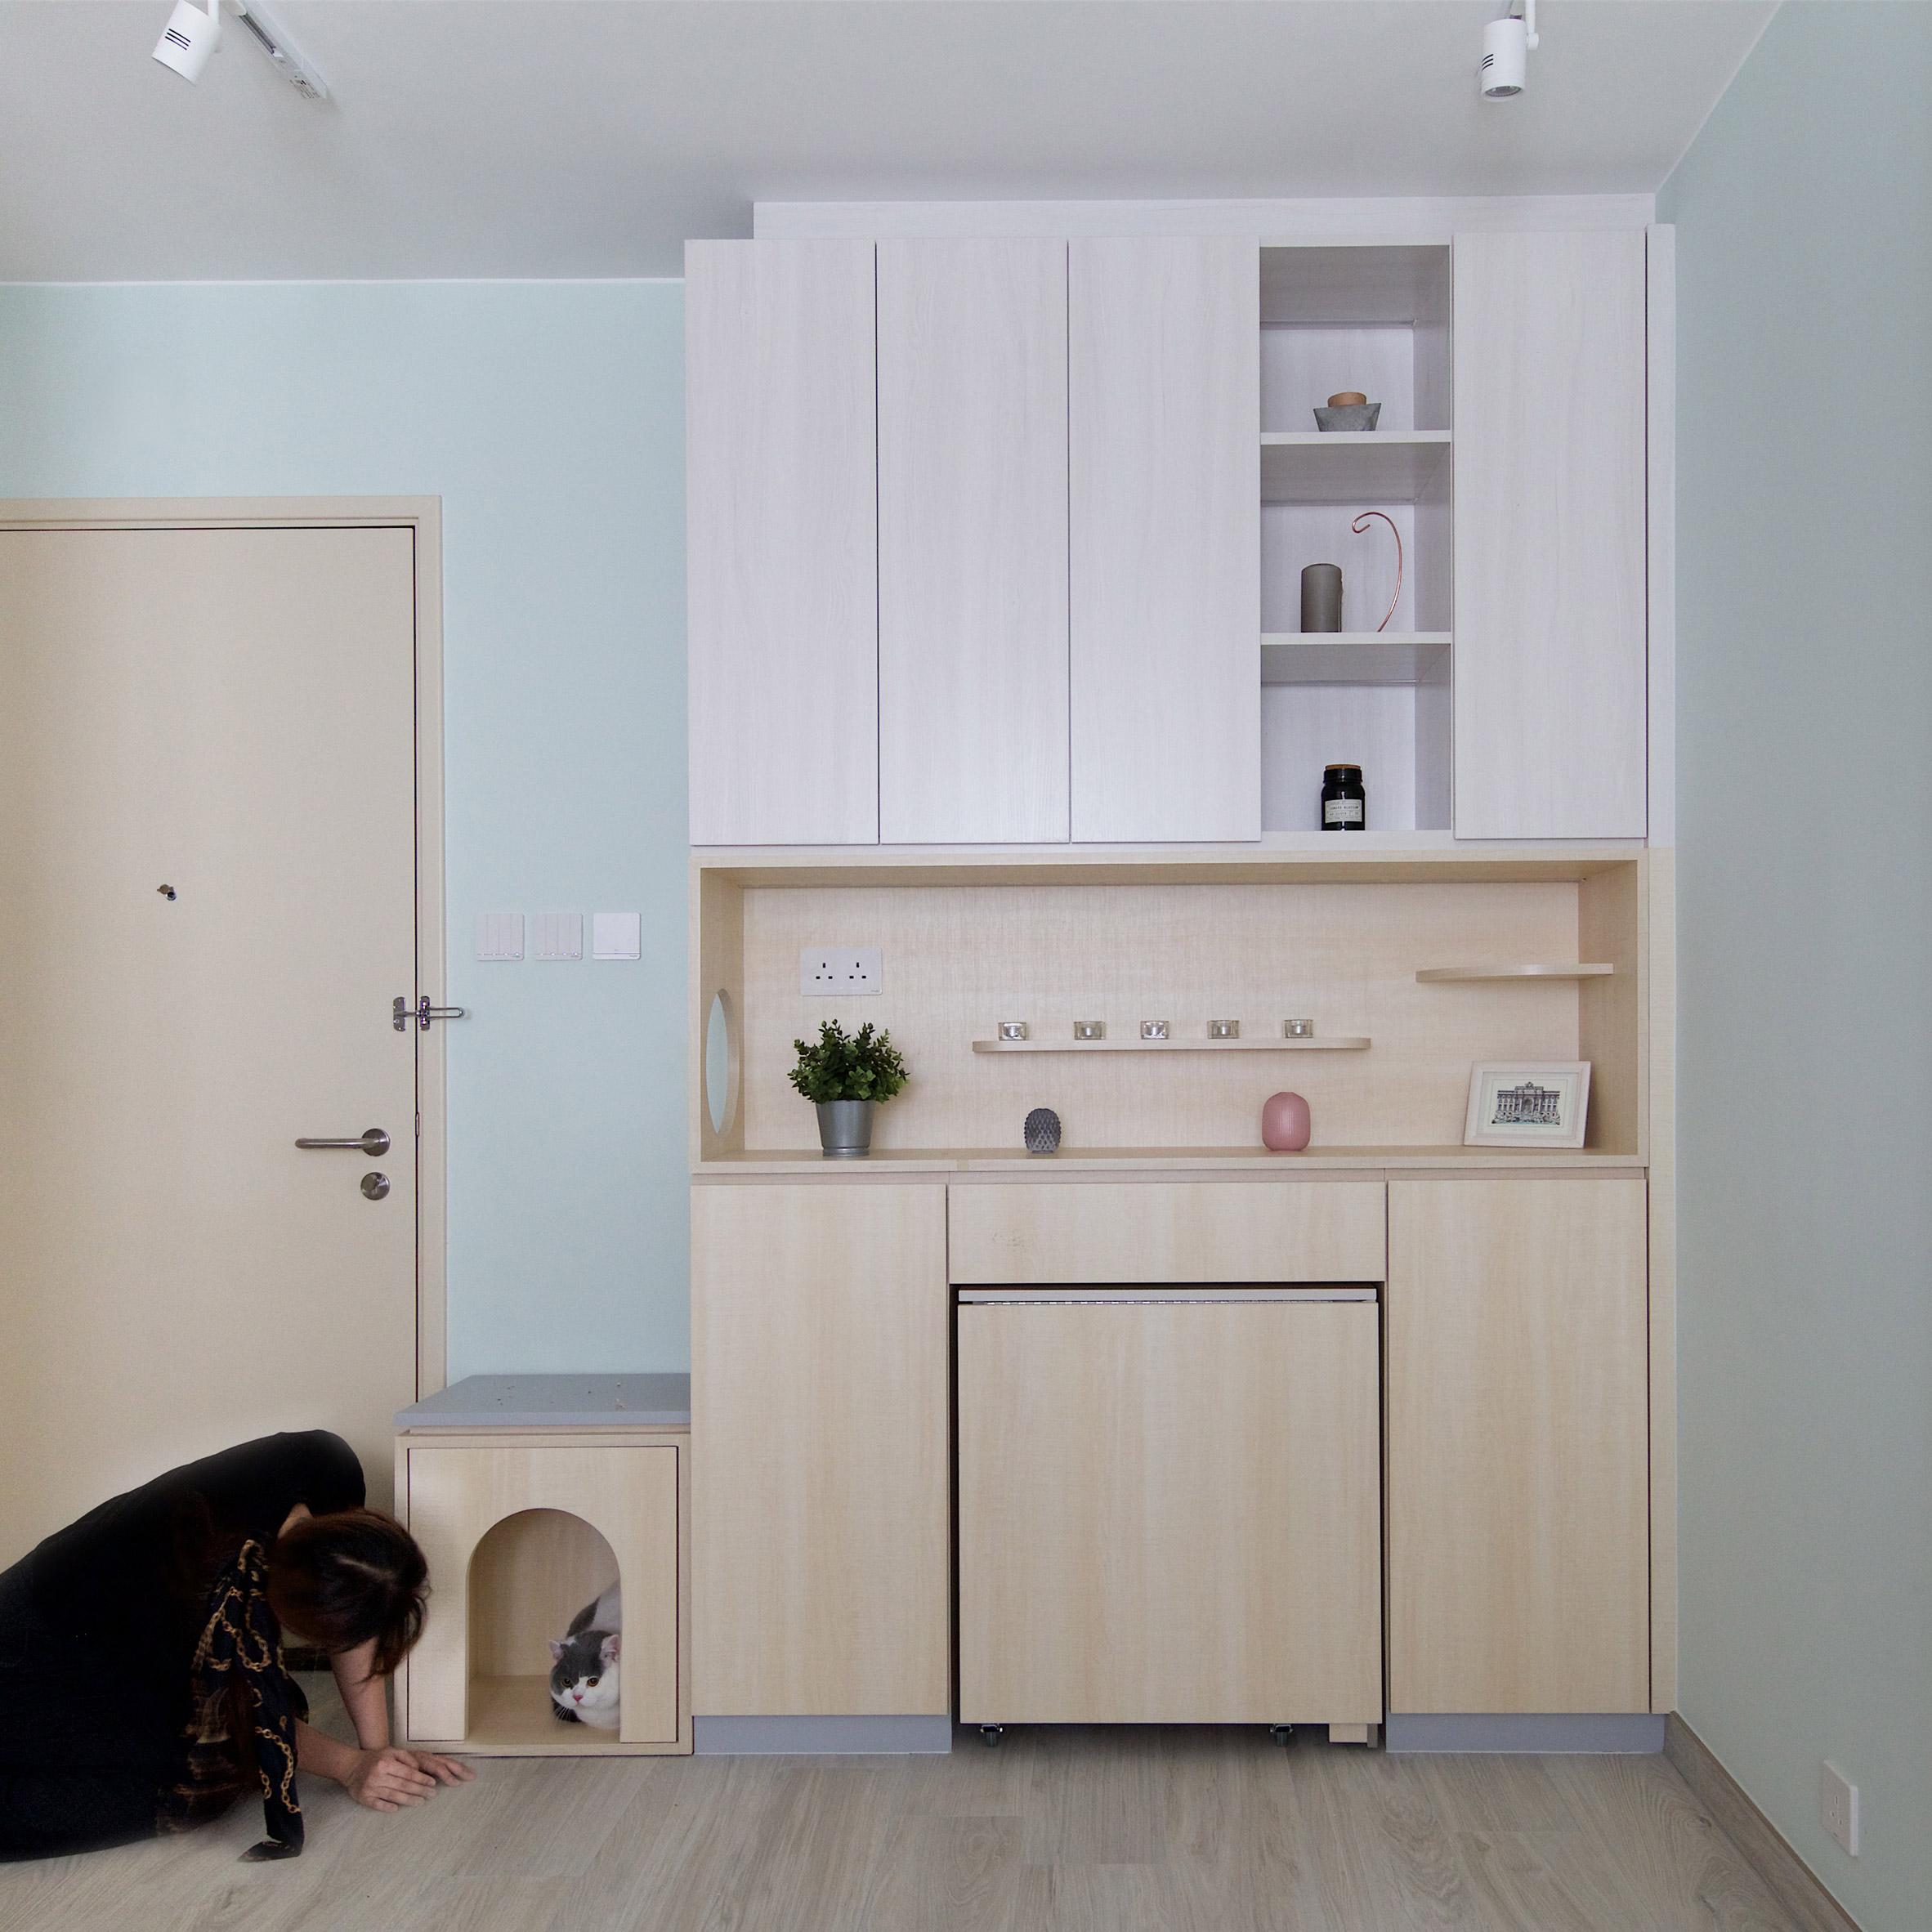 Ital Designs Hong Kong pets playground apartment by sim-plex design studio is